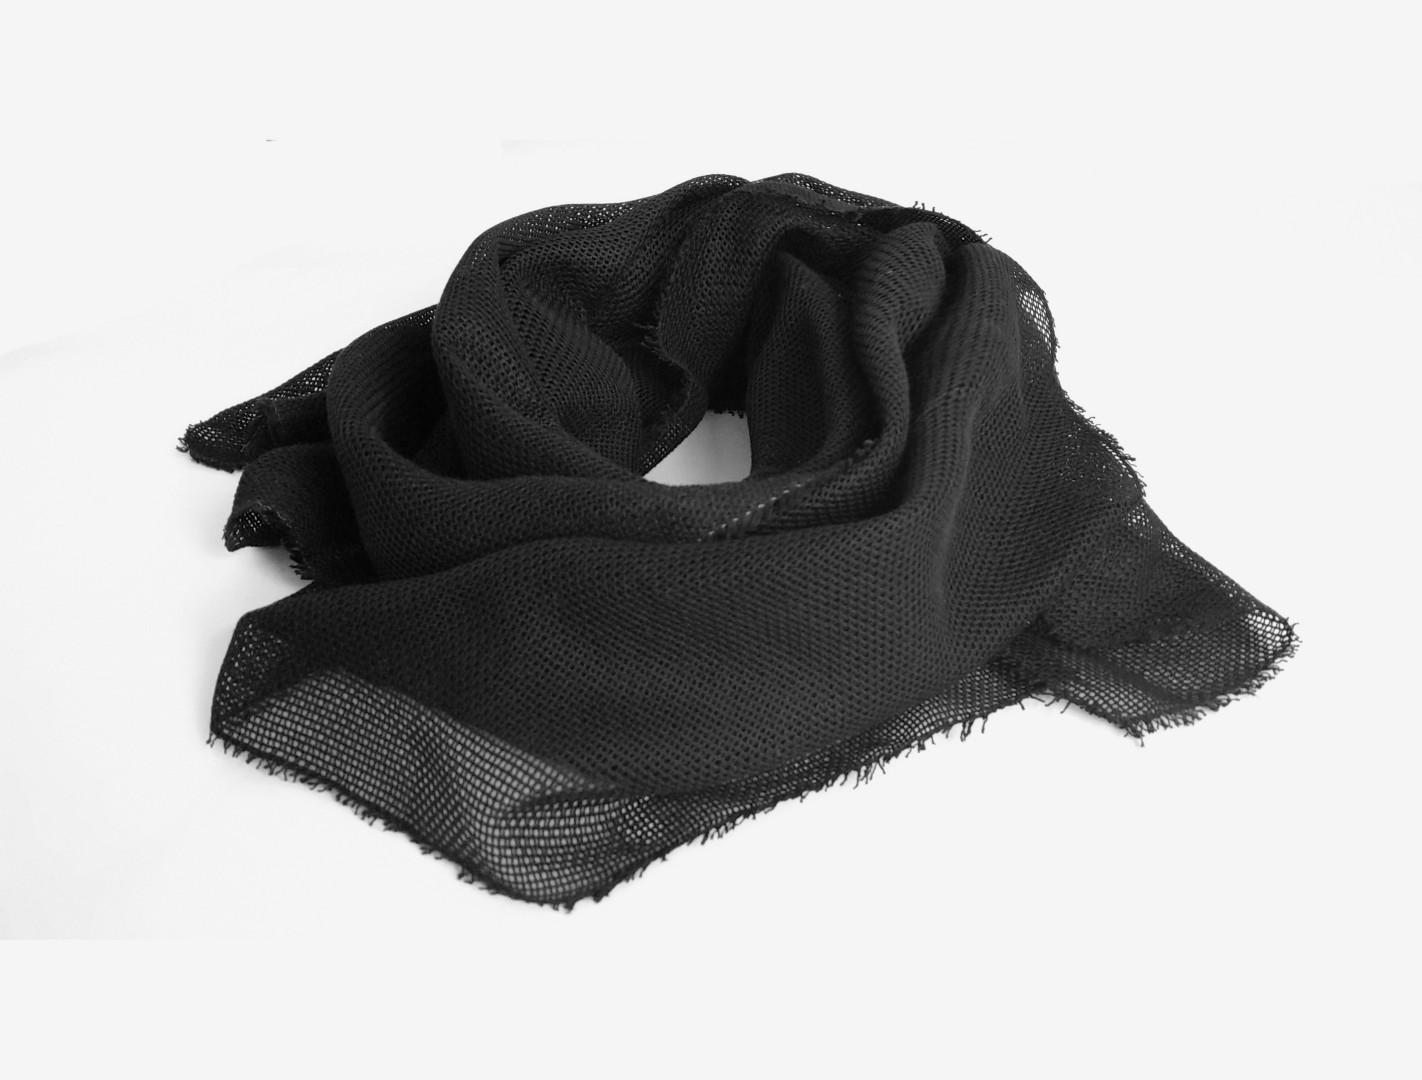 black-mesh-rannka-unisex-cotton-urban-designer-scarf.jpg